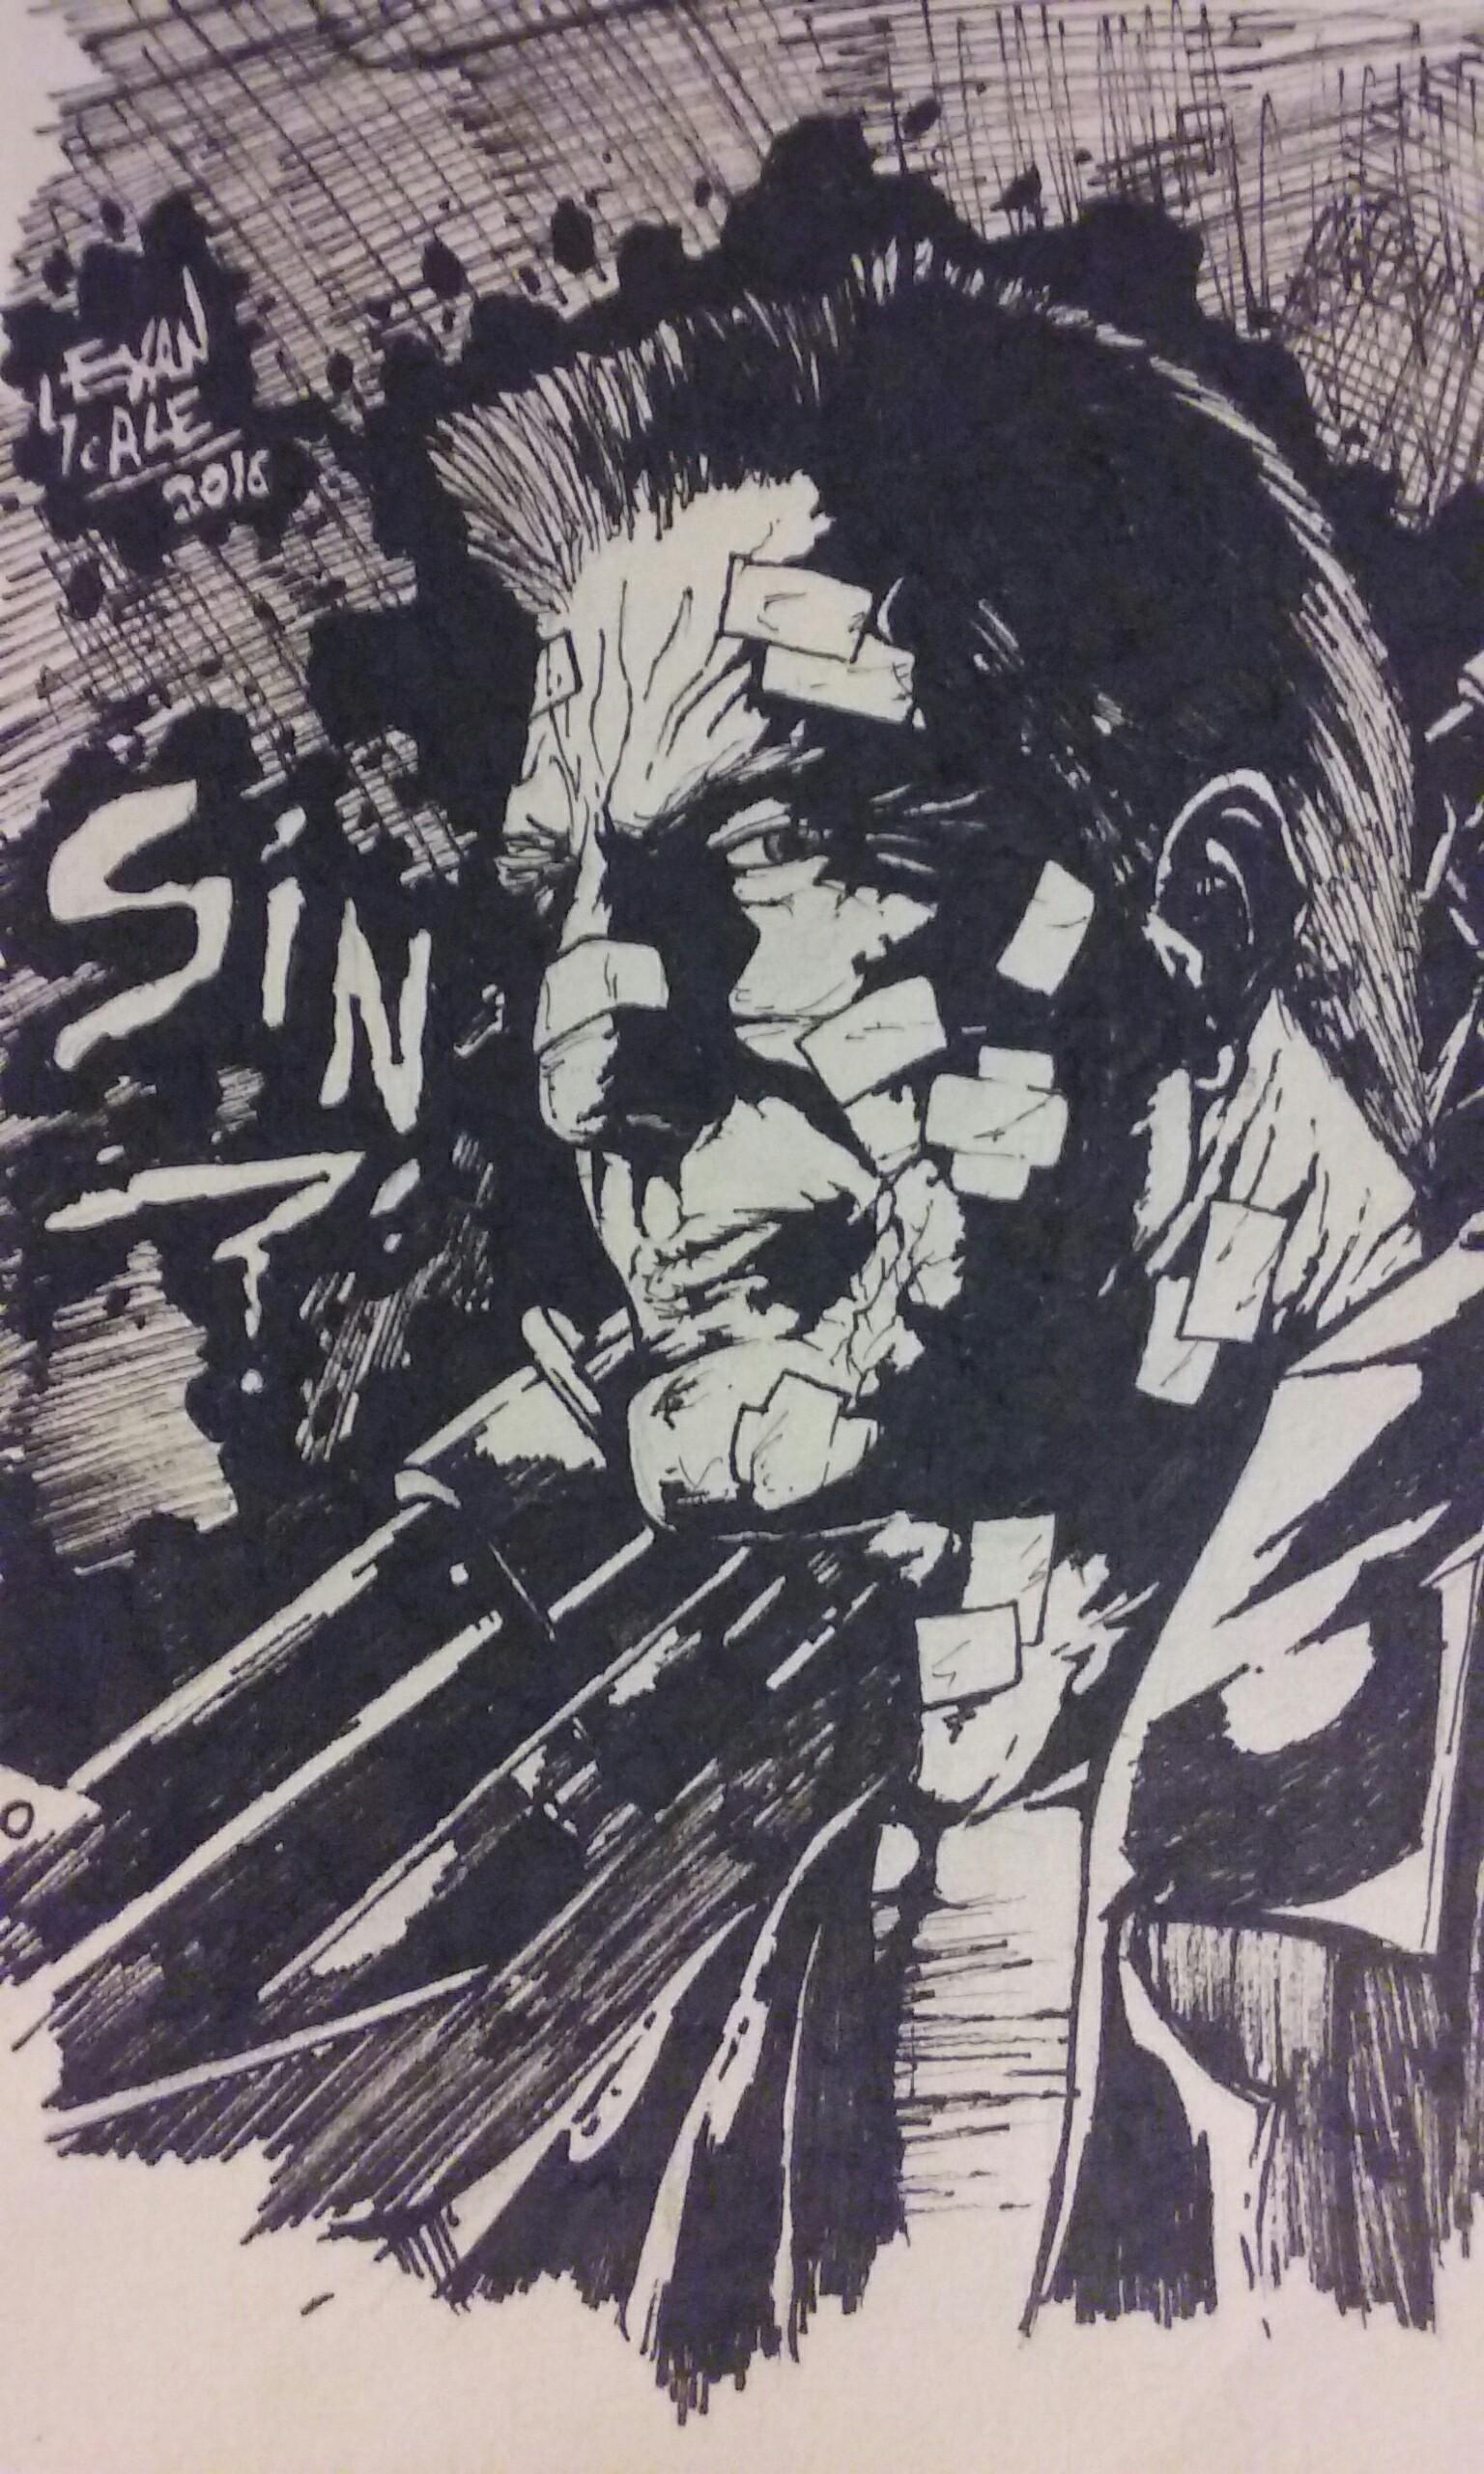 DAY 28 - Sin